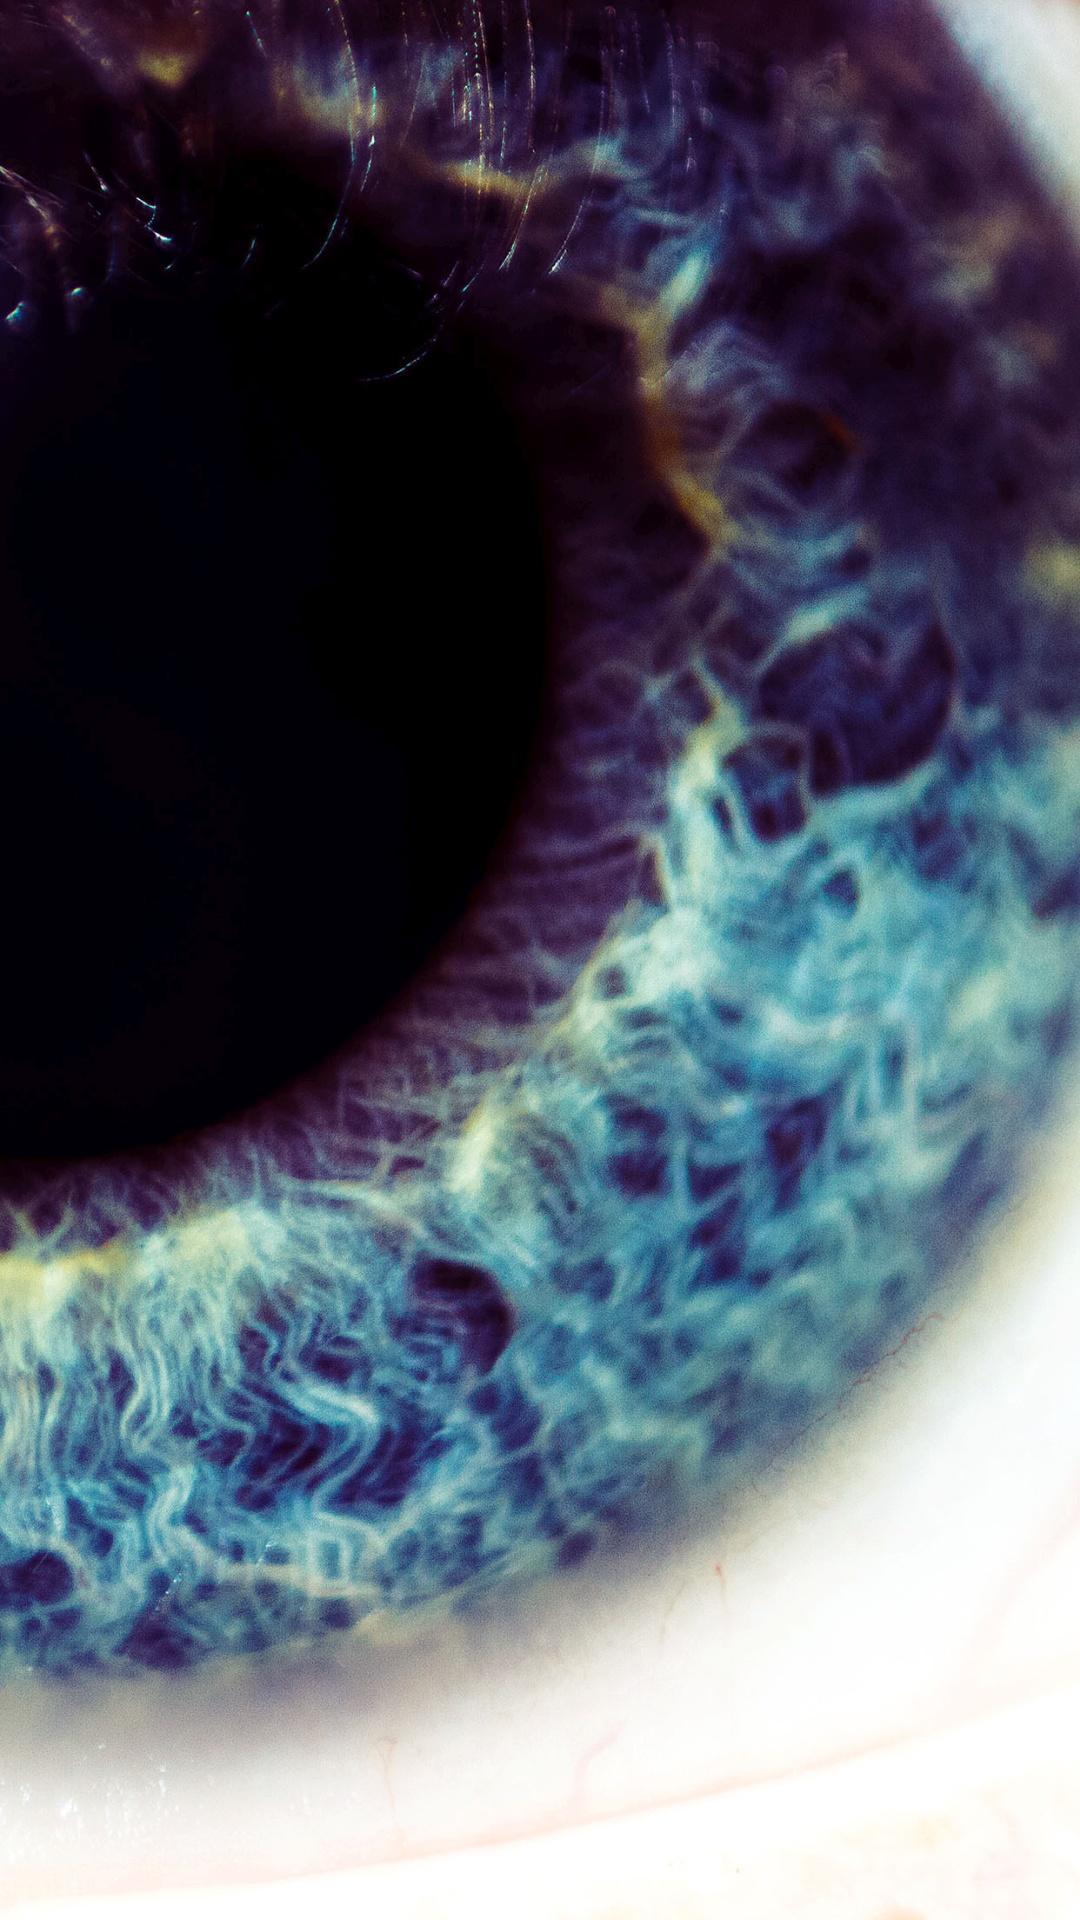 Blue Eye iPhone 7 Wallpaper